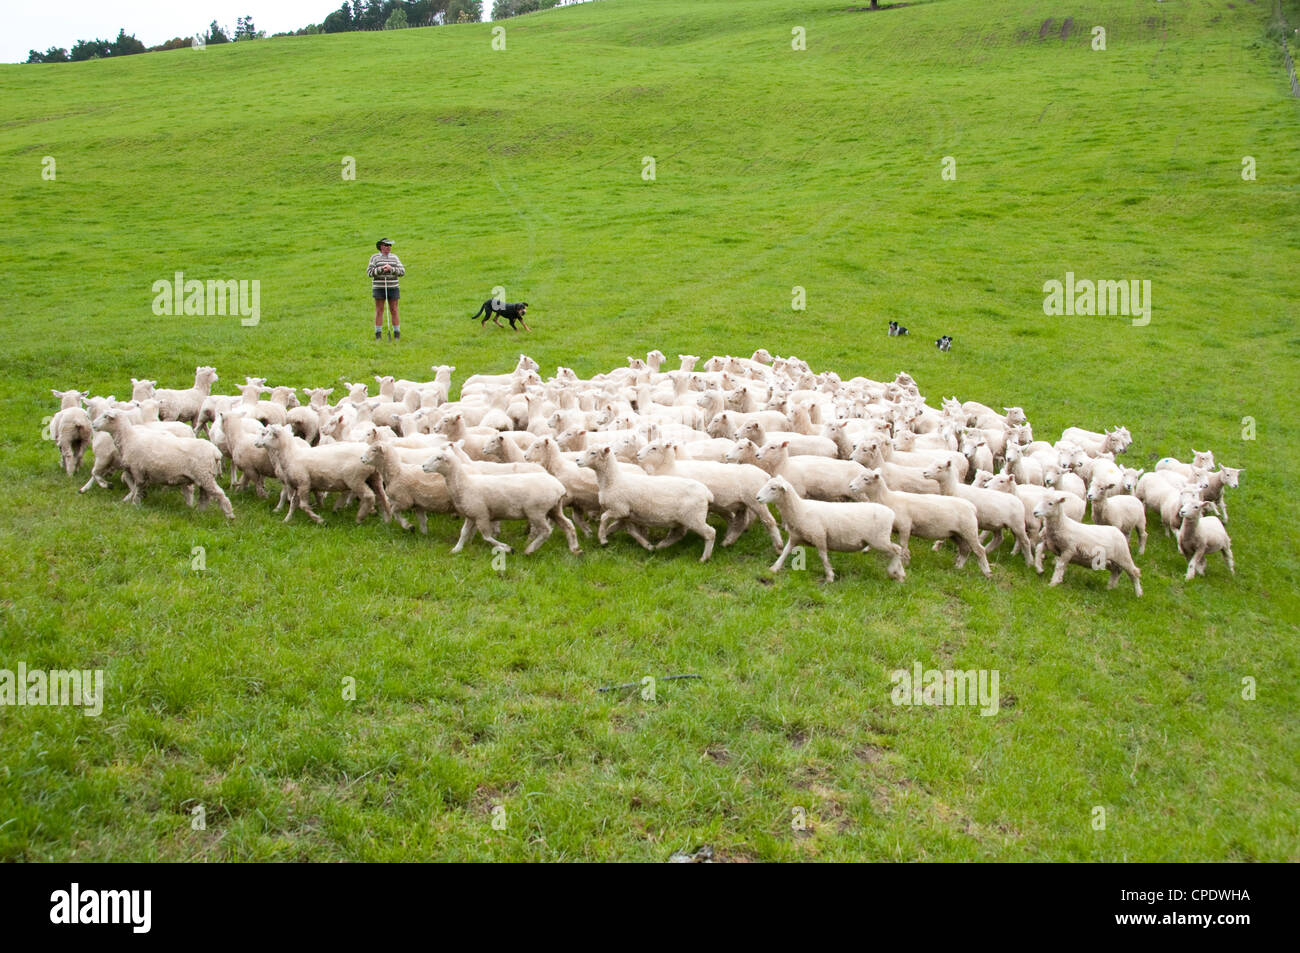 New Zealand North Island near Wellington, shepherd and sheep dogs herd sheep near Wool Shed in Wairarapa - Stock Image